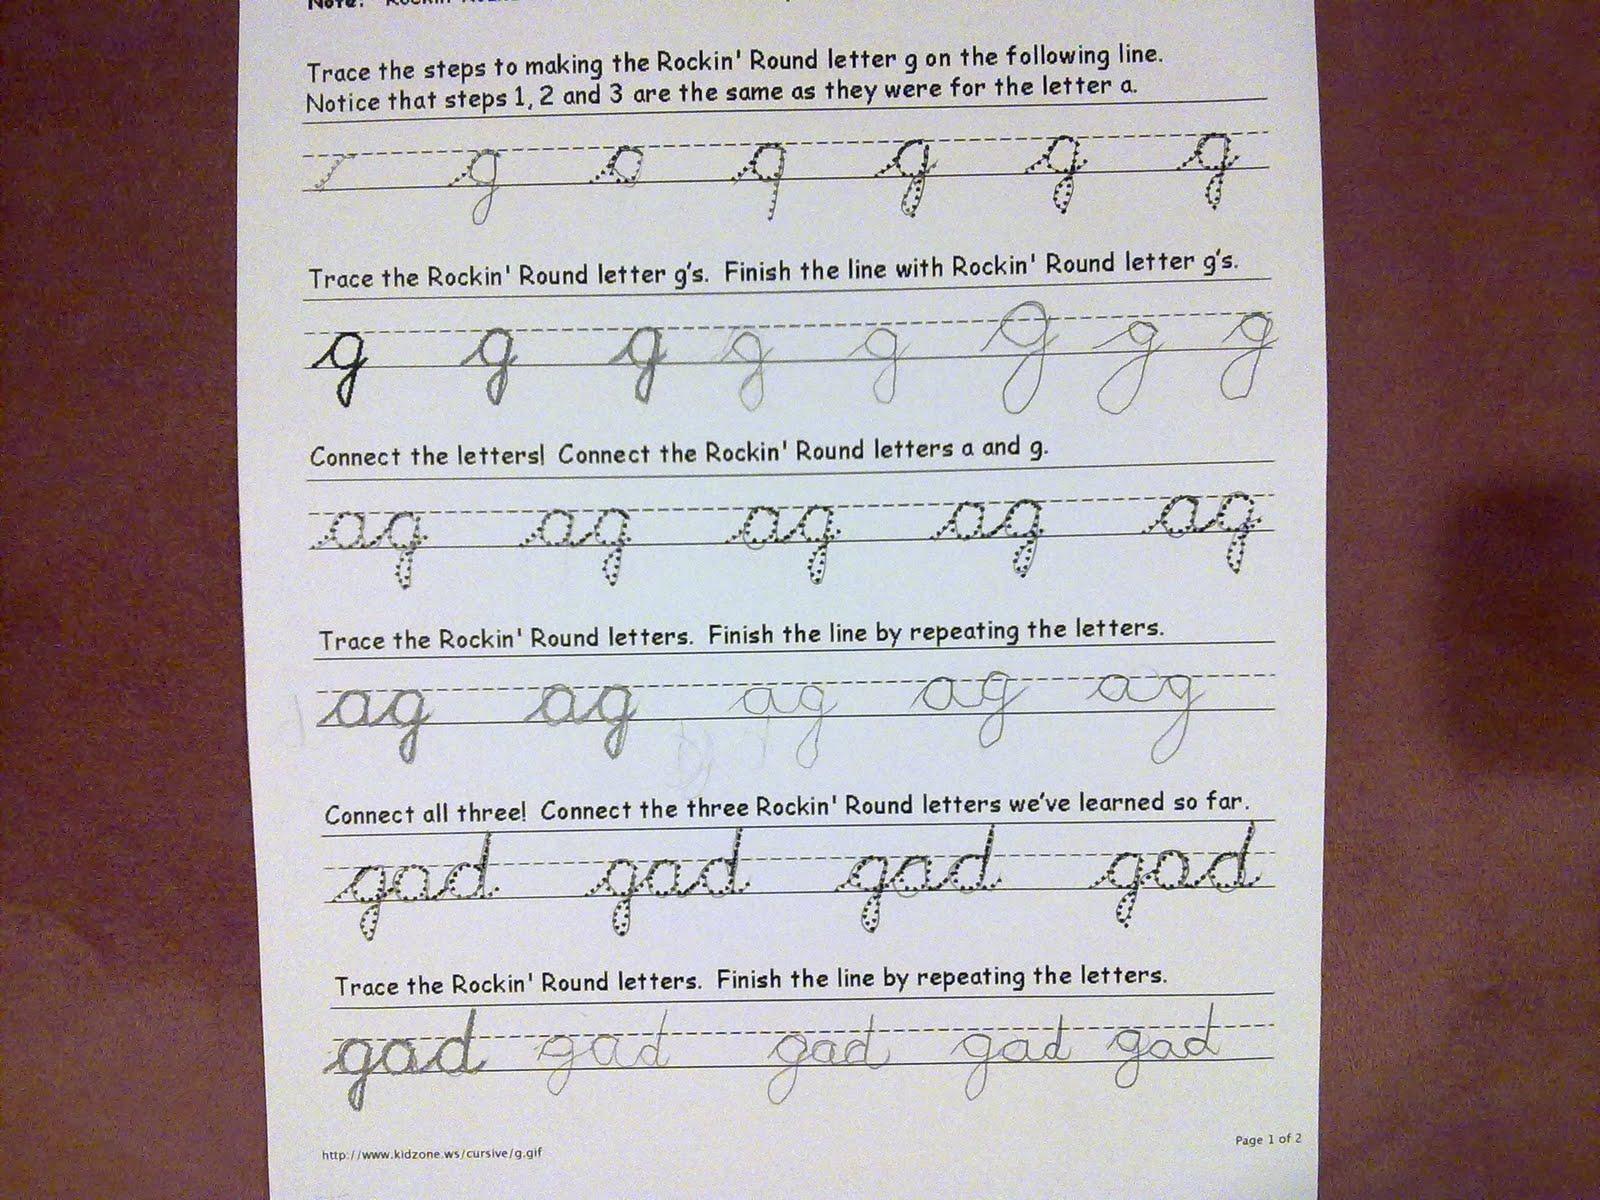 reese matthew s secret isle cursive writing